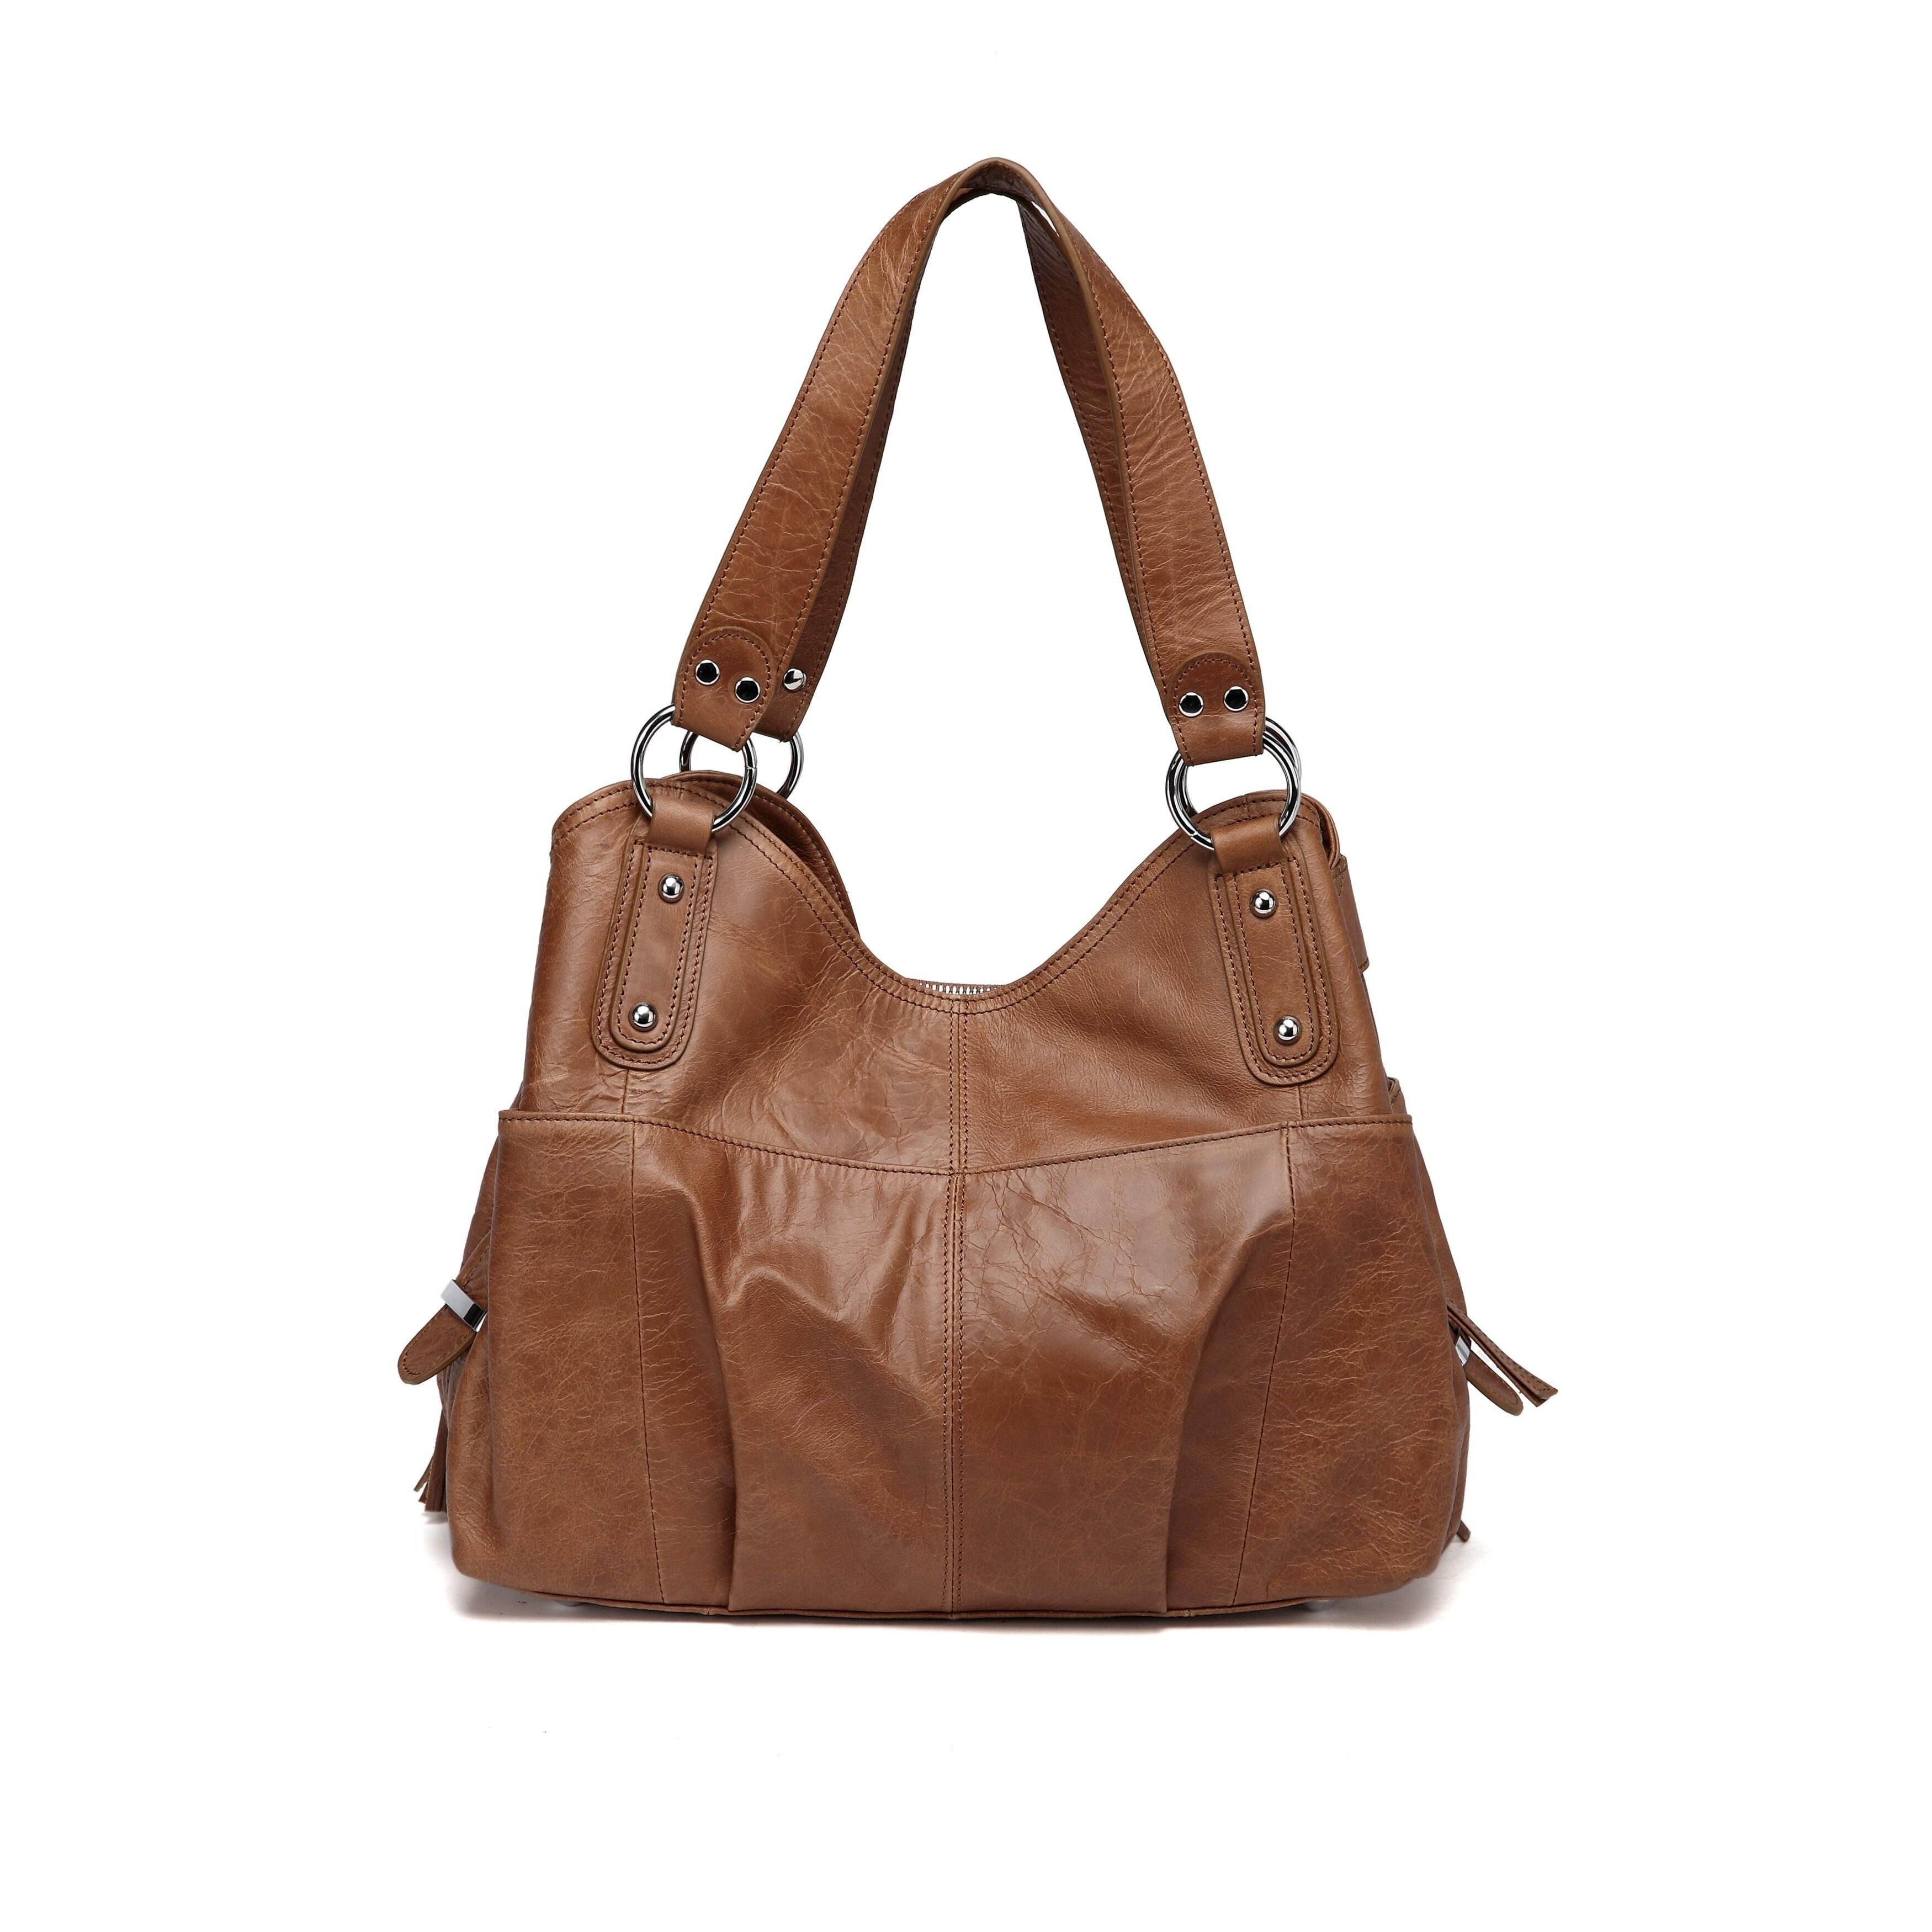 Shop Vicenzo Leather Athena Tan Italian Leather Handbag - Free ... f7cdd6a862